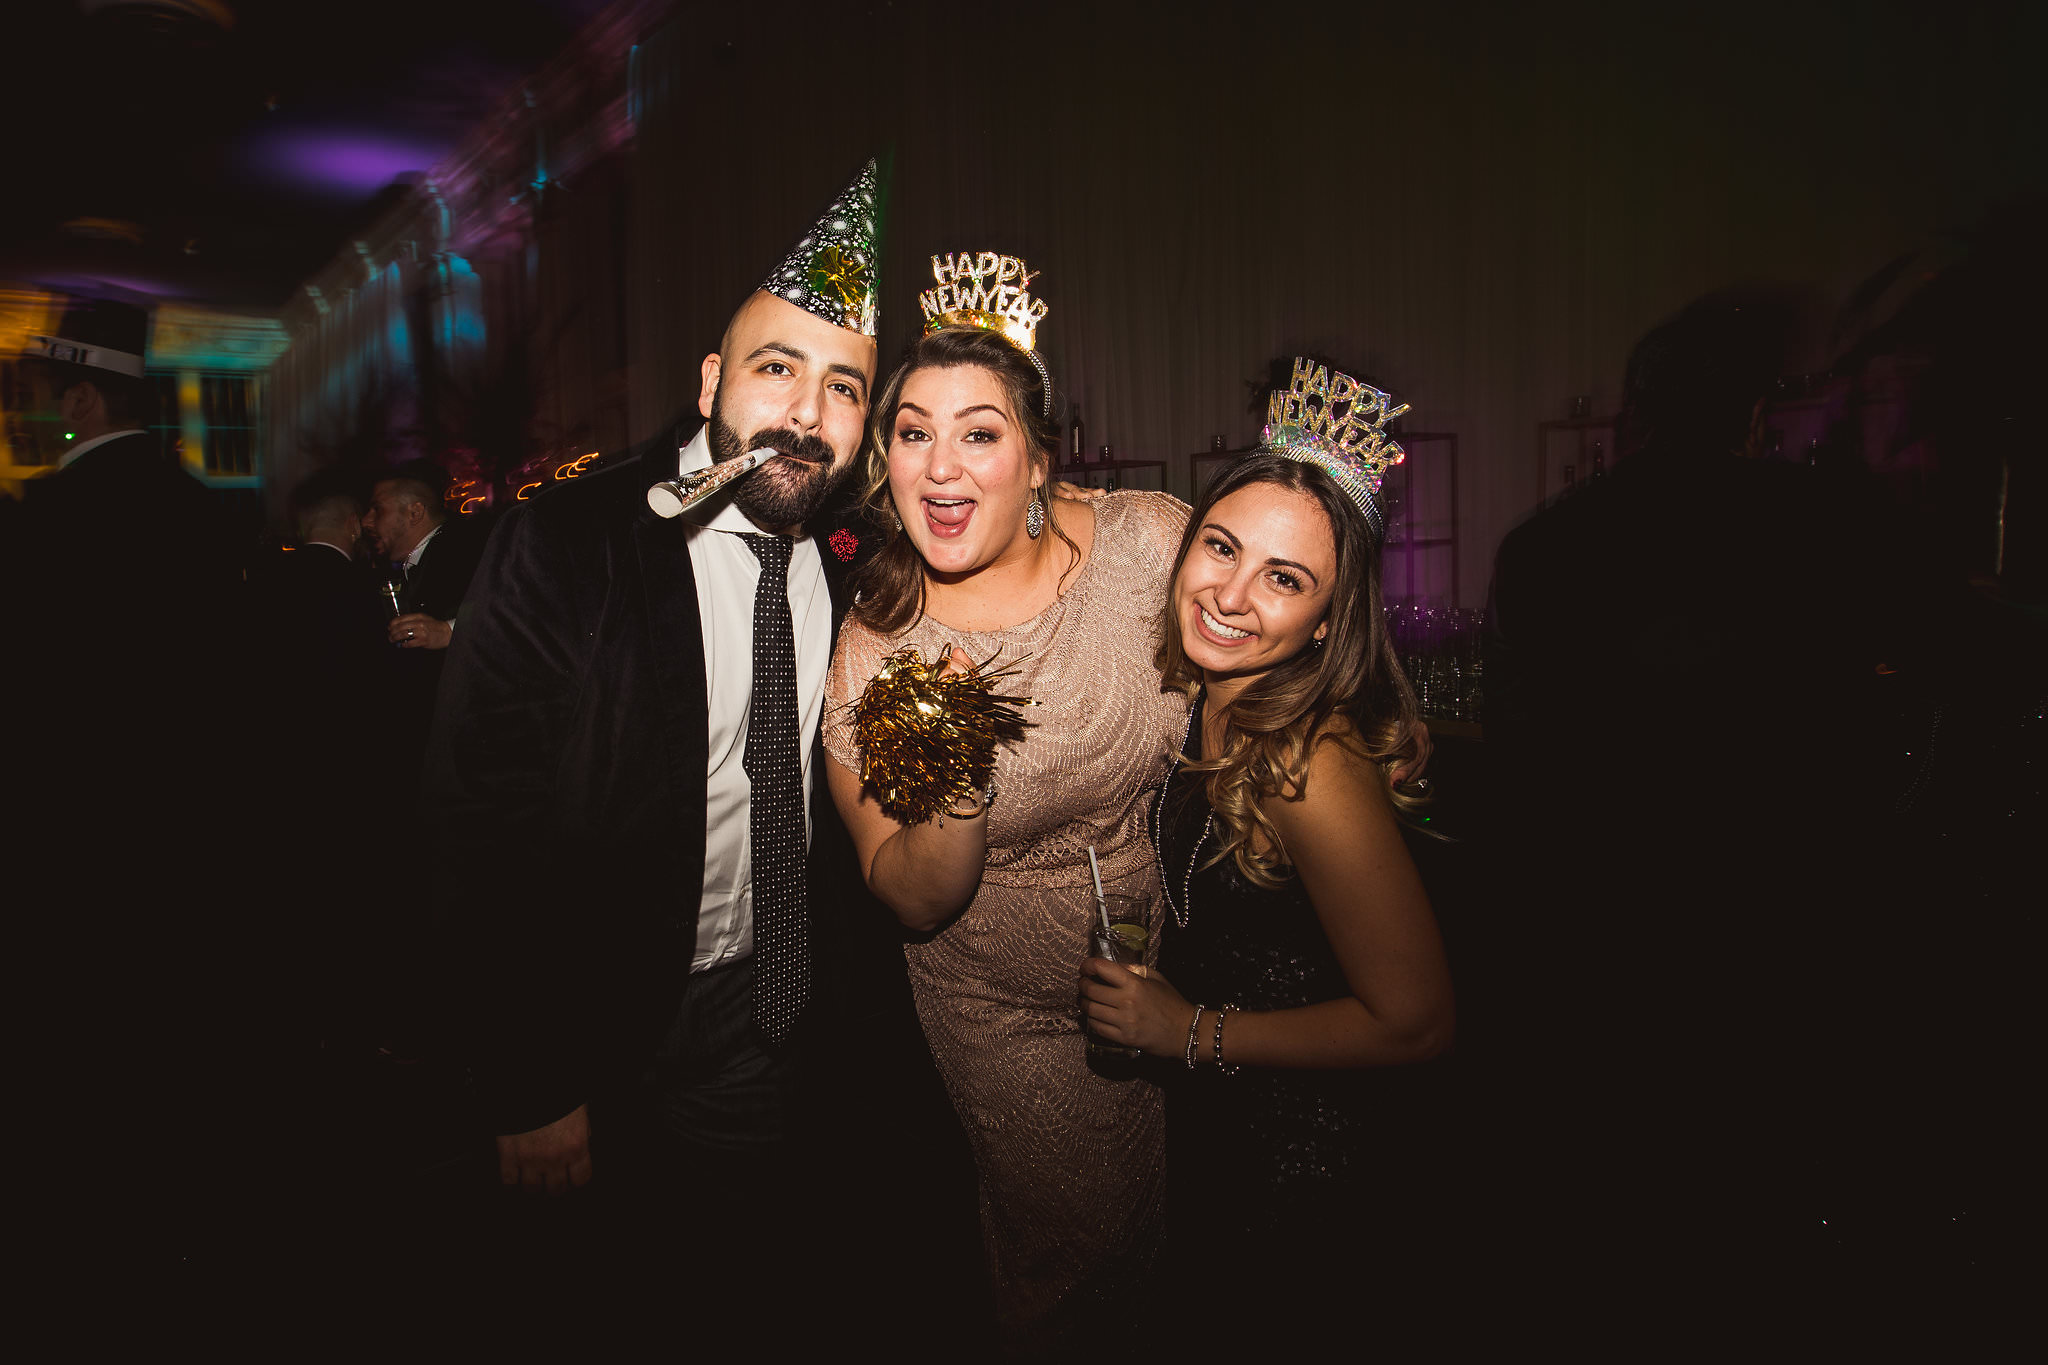 new years wedding photos